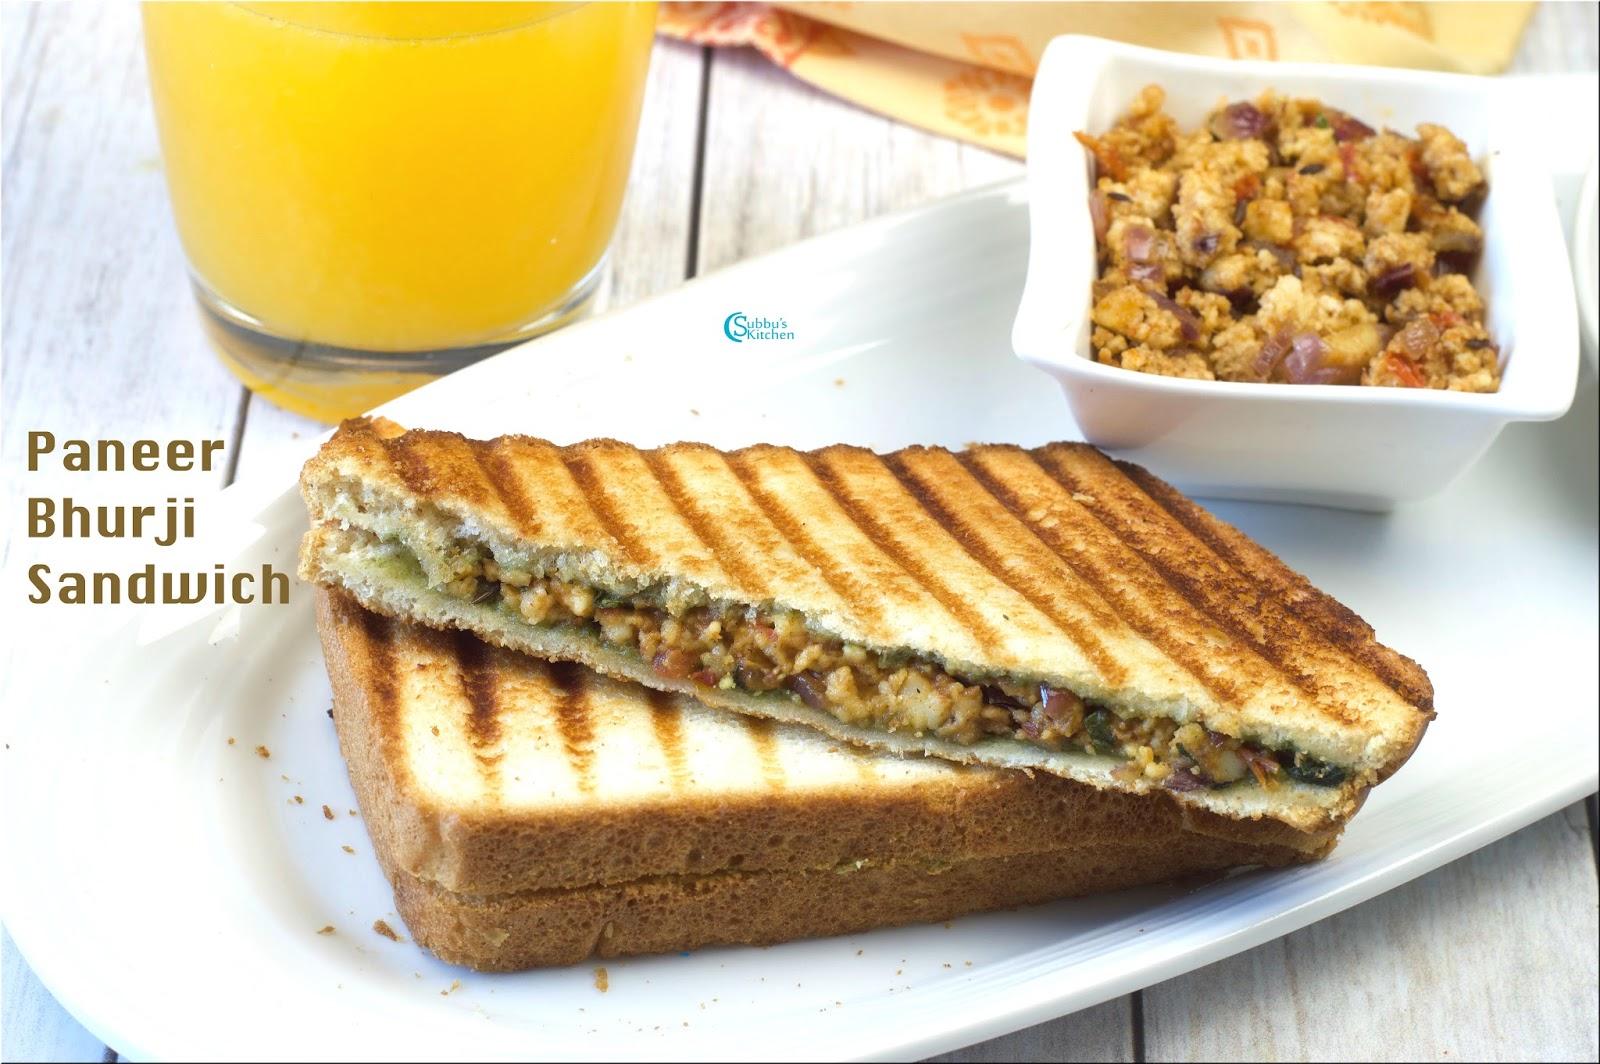 Paneer Bhurji Sandwich Recipe - Subbus Kitchen